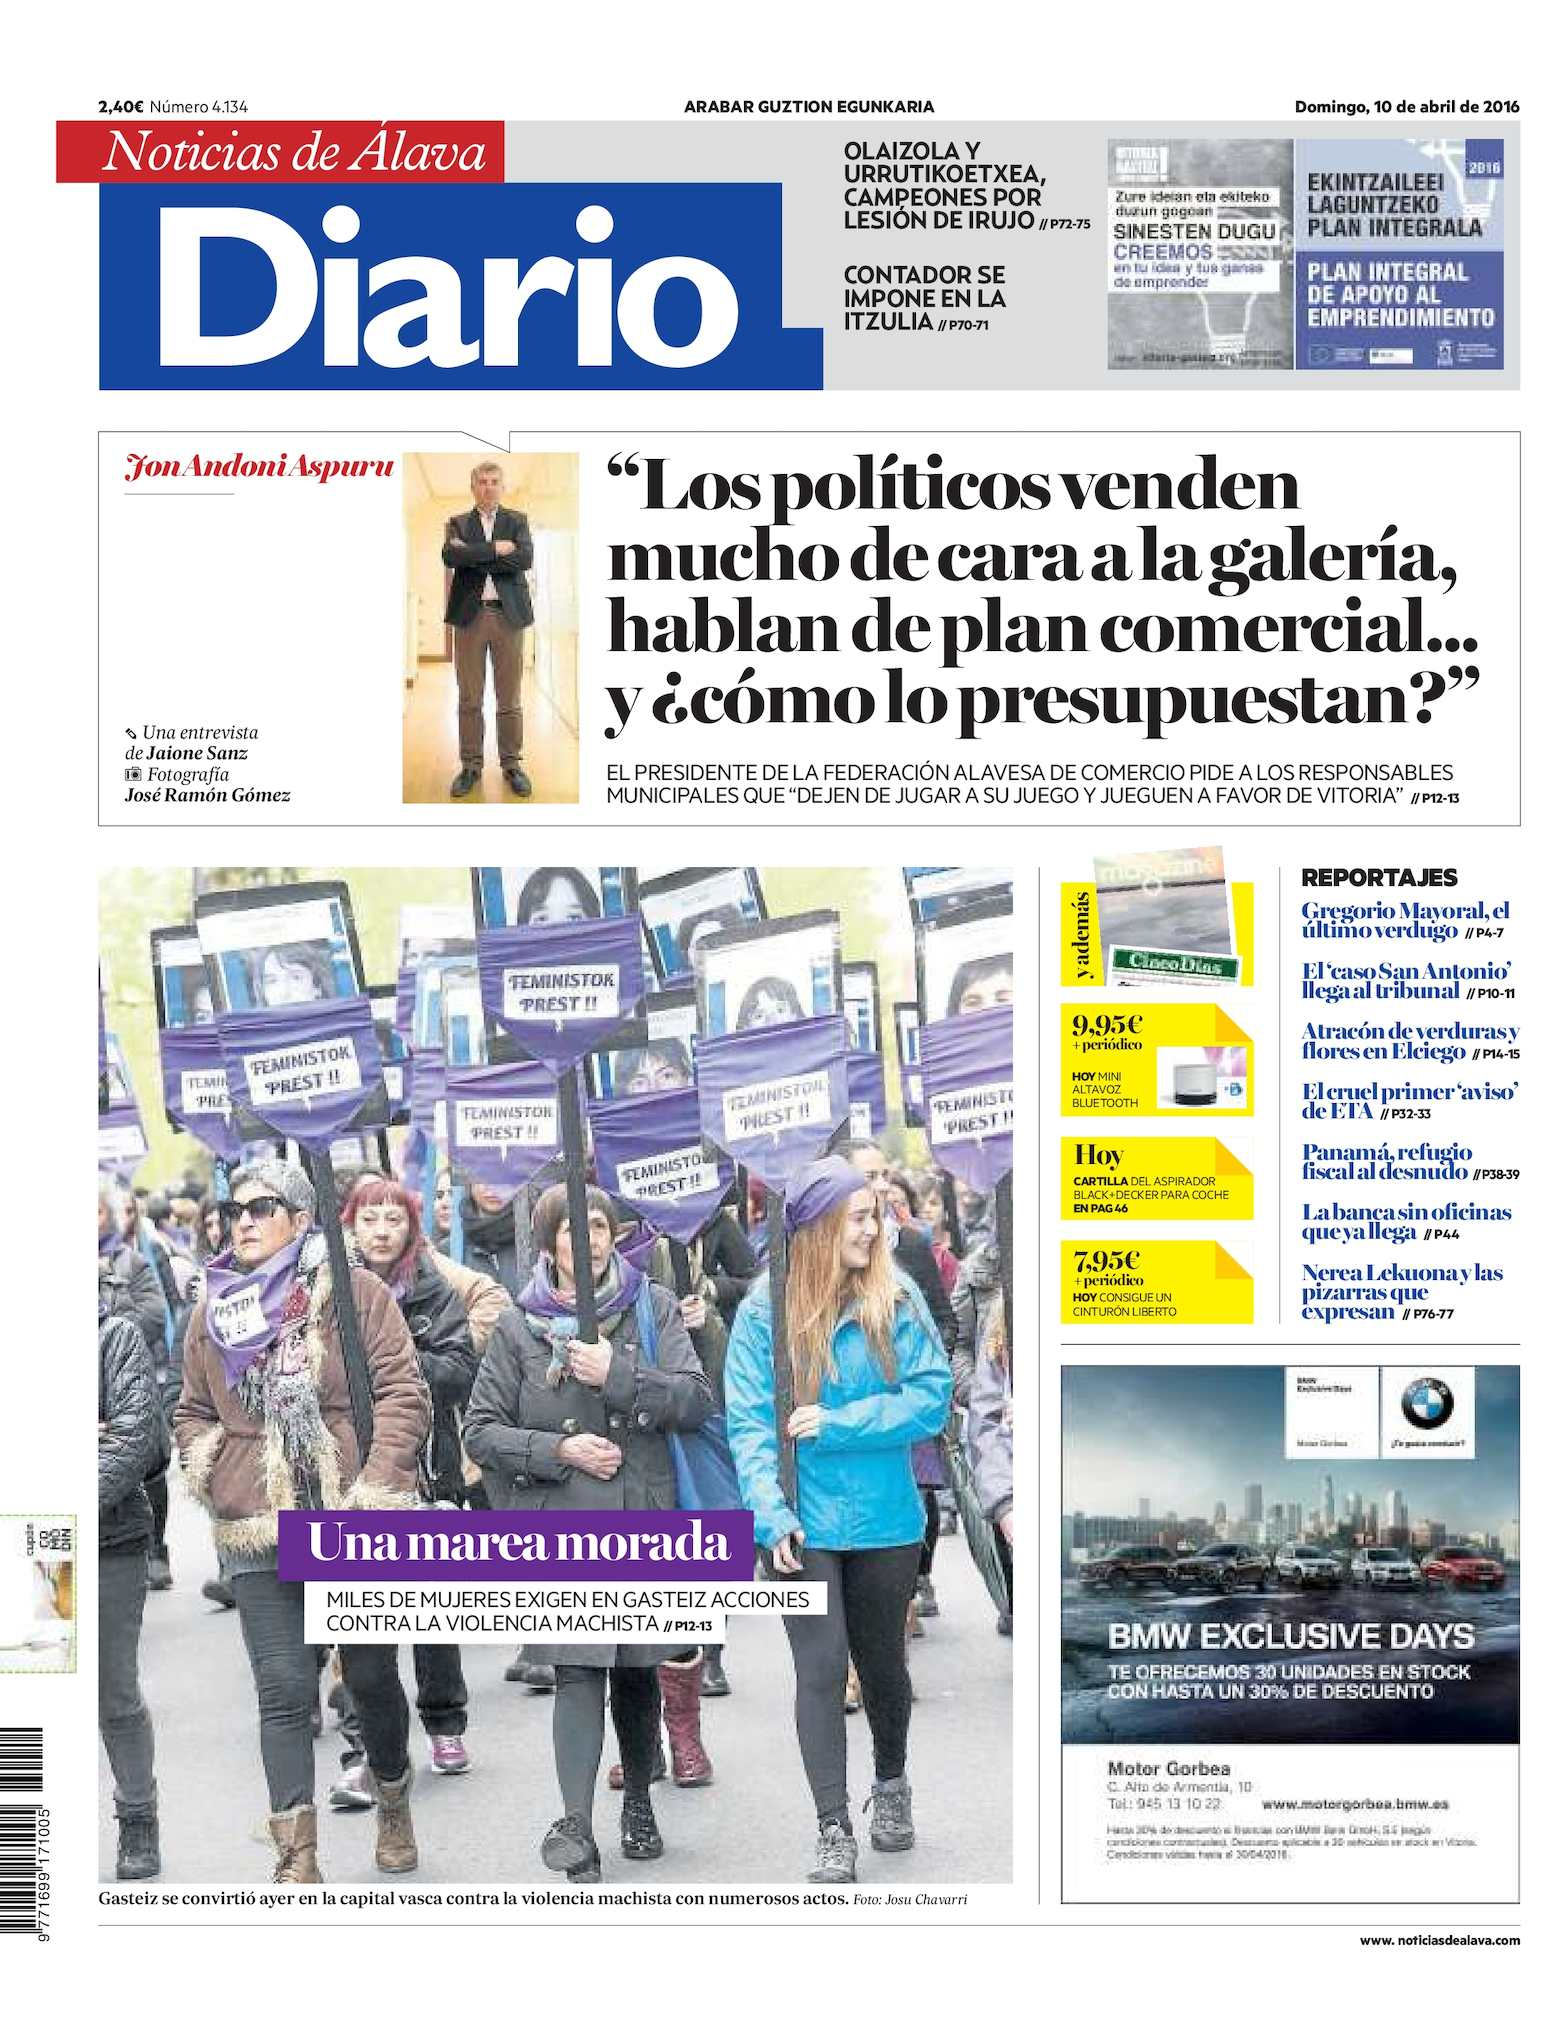 Calaméo - Diario de Noticias de Álava 20160410 97ce786d0b5c